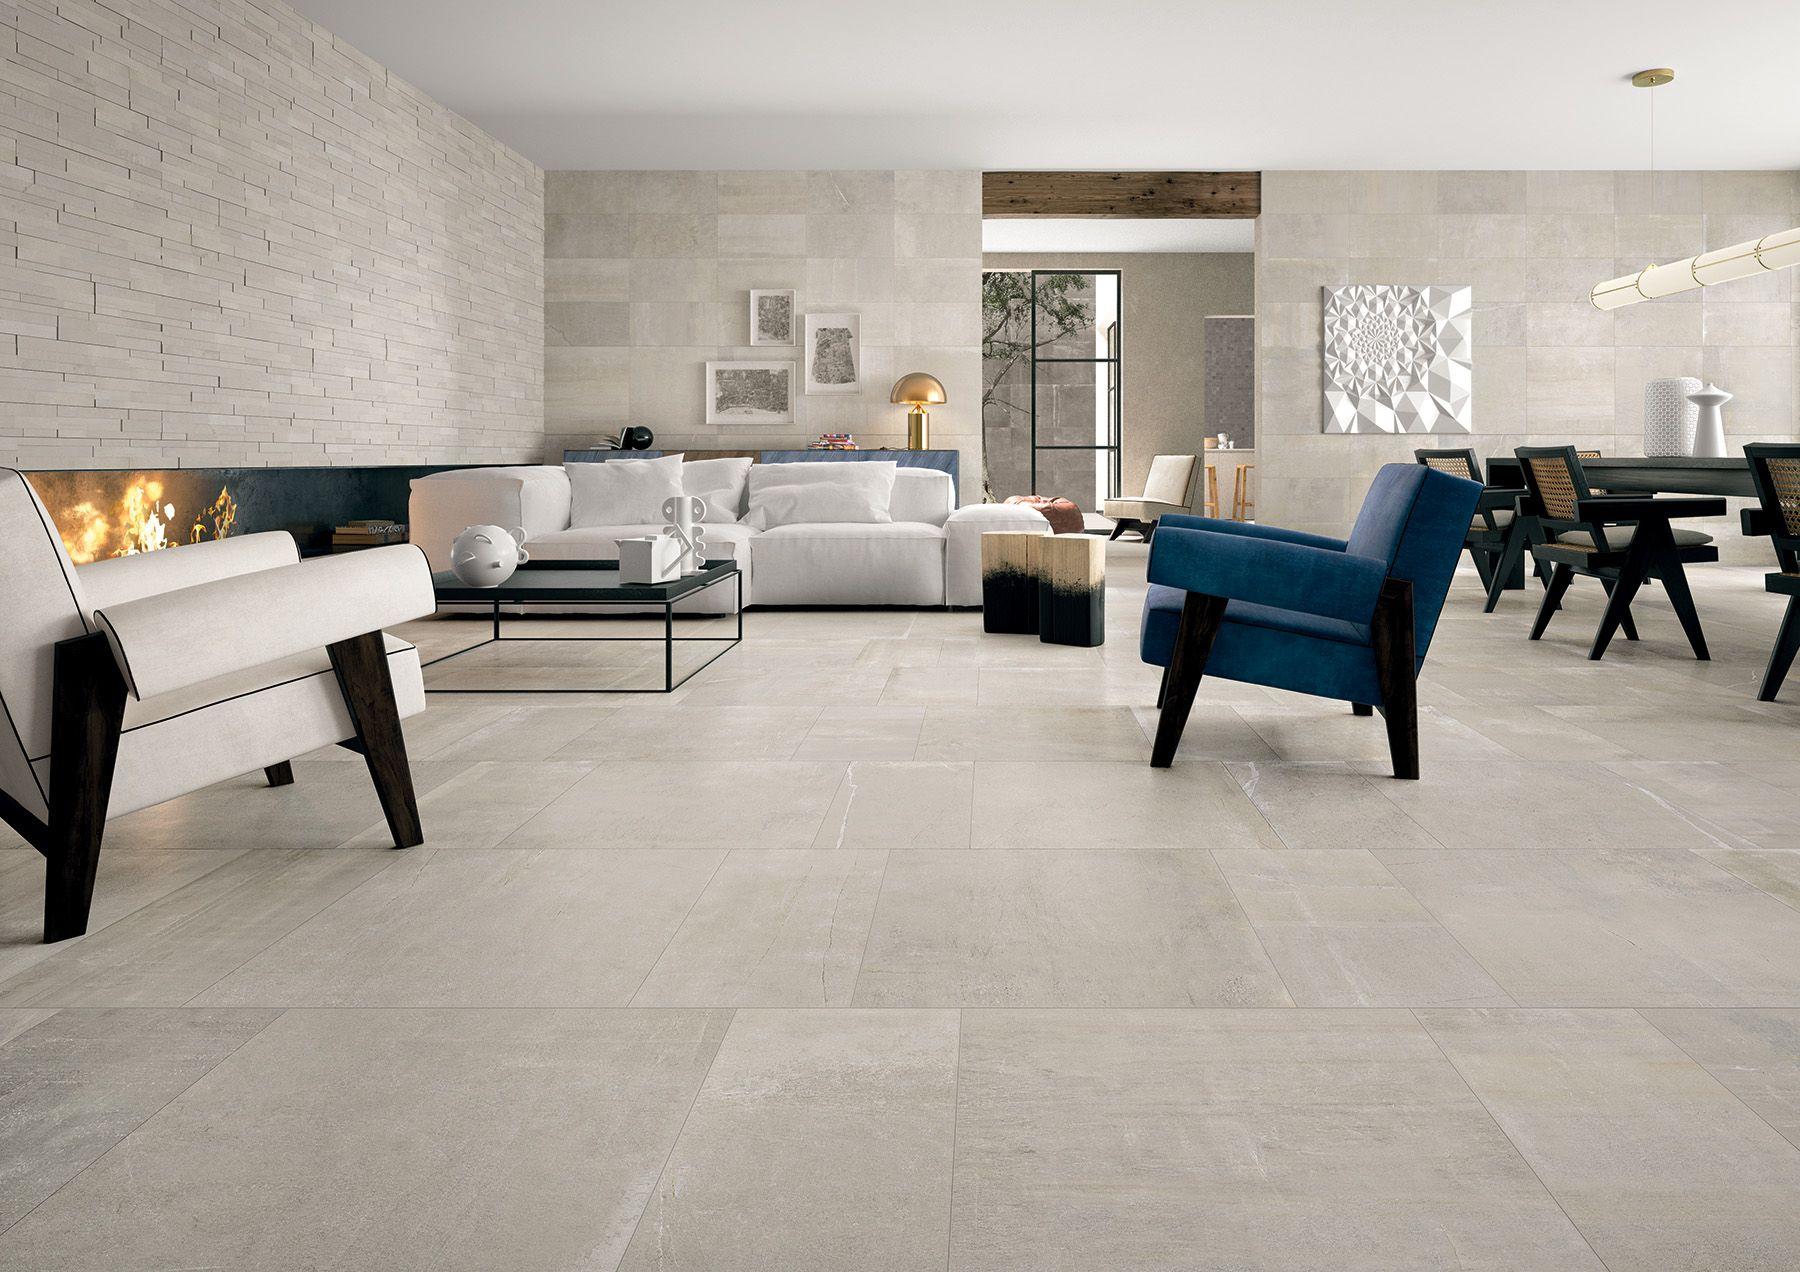 Sassuolo Sandstone In 2020 Style Tile Wall Floor Tiles